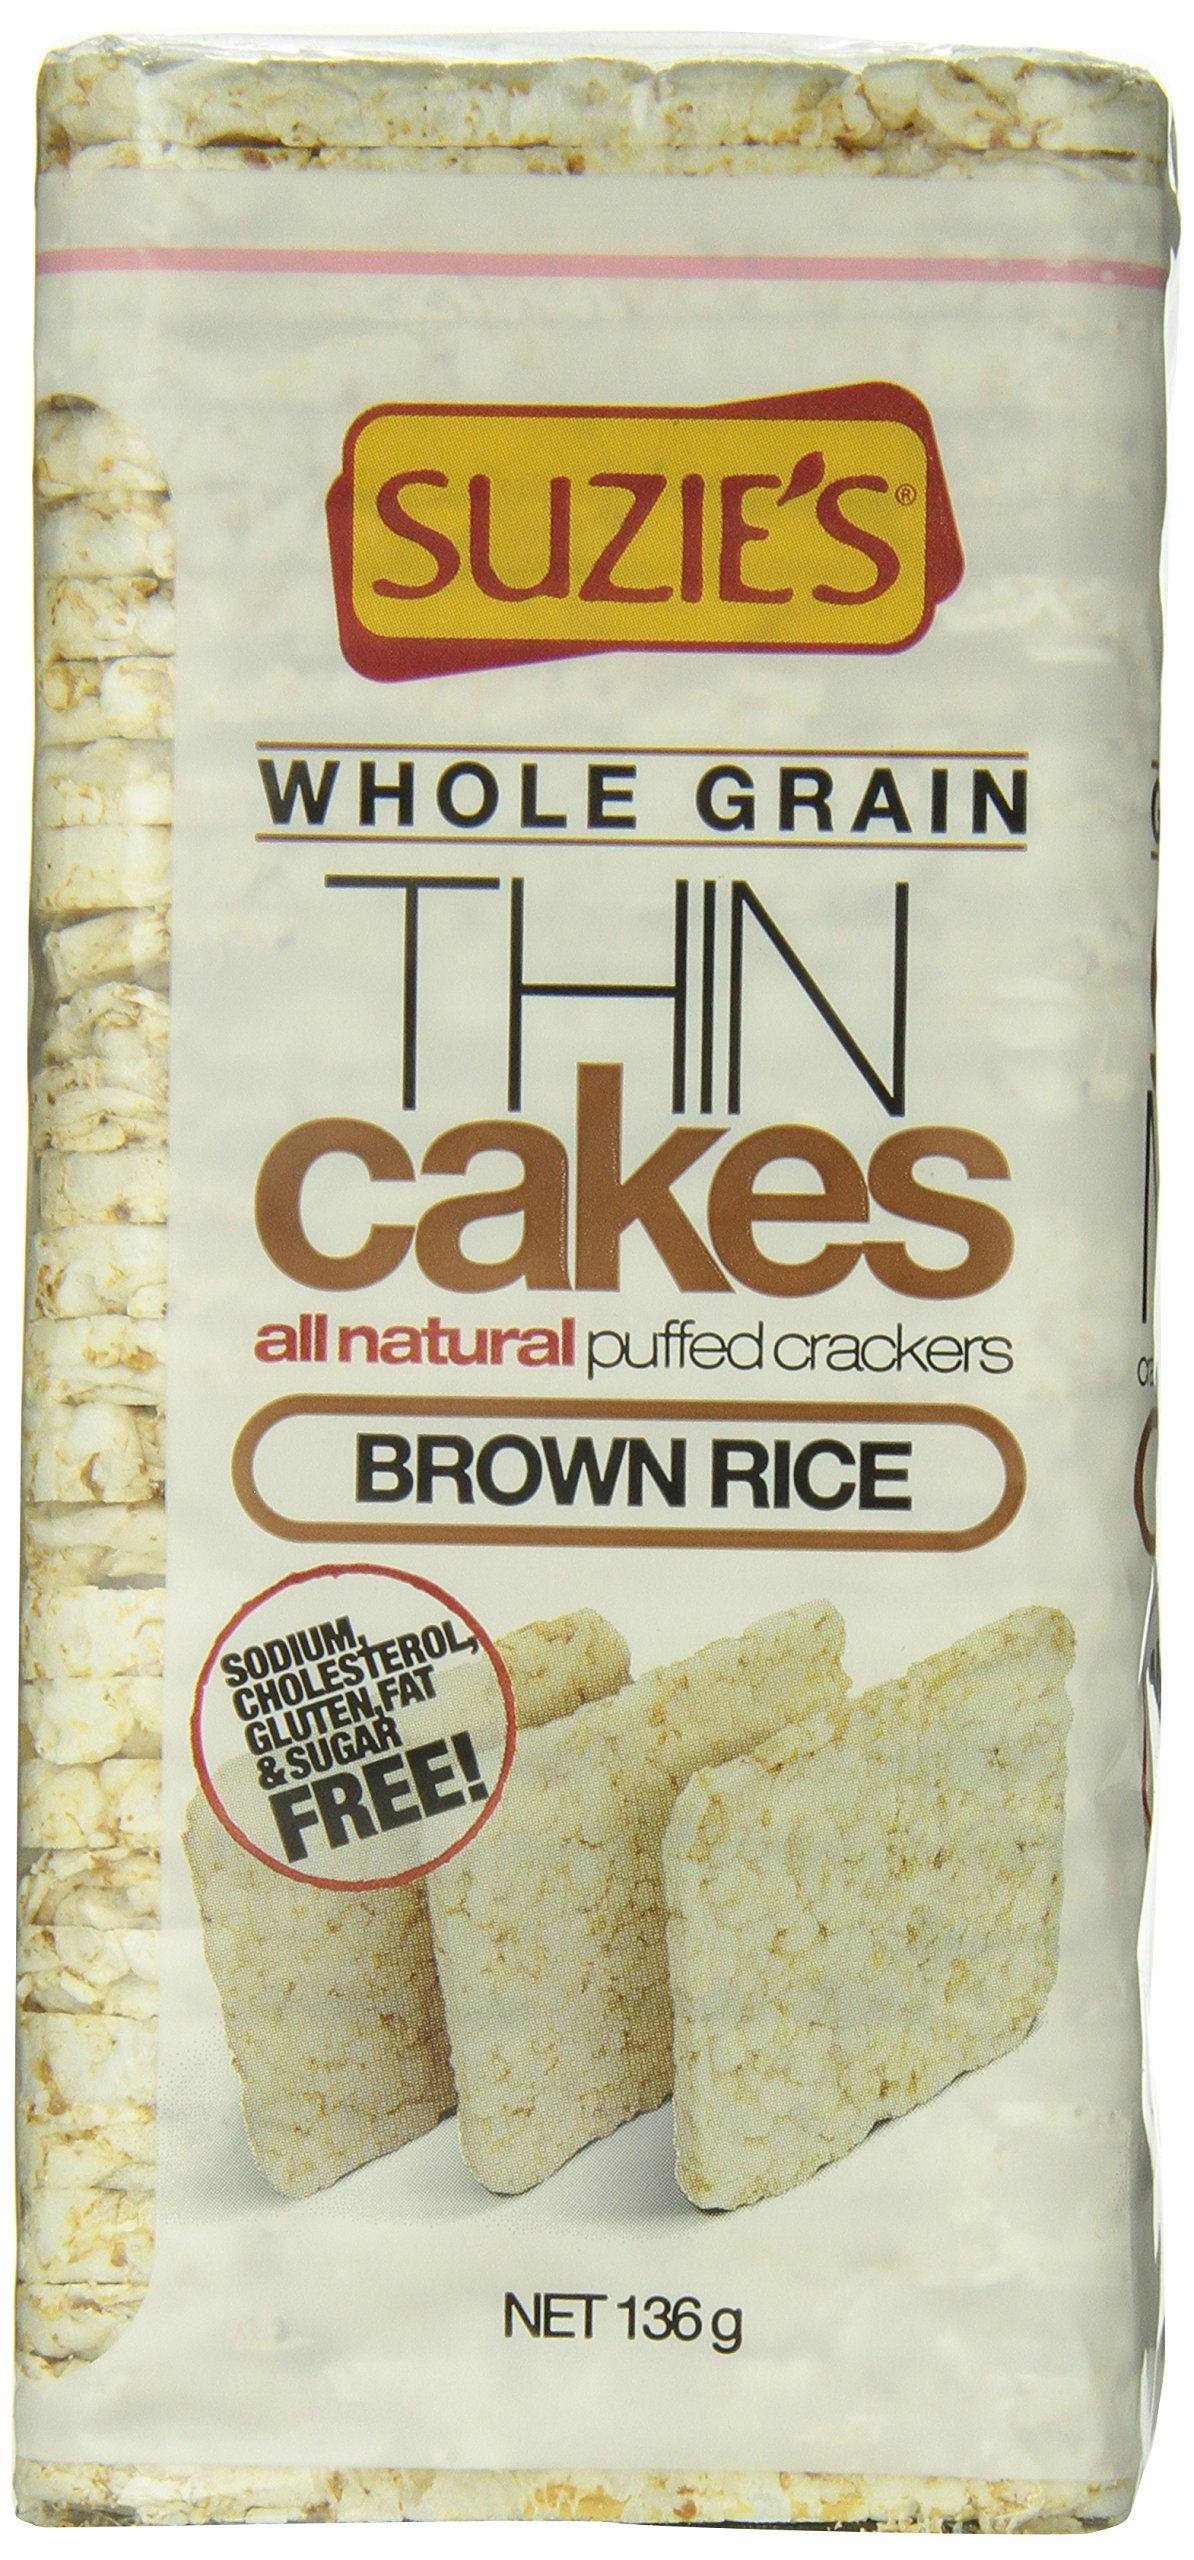 Suzie's Whole Grain Thin Cakes Brown Rice, 4.9 Ounce